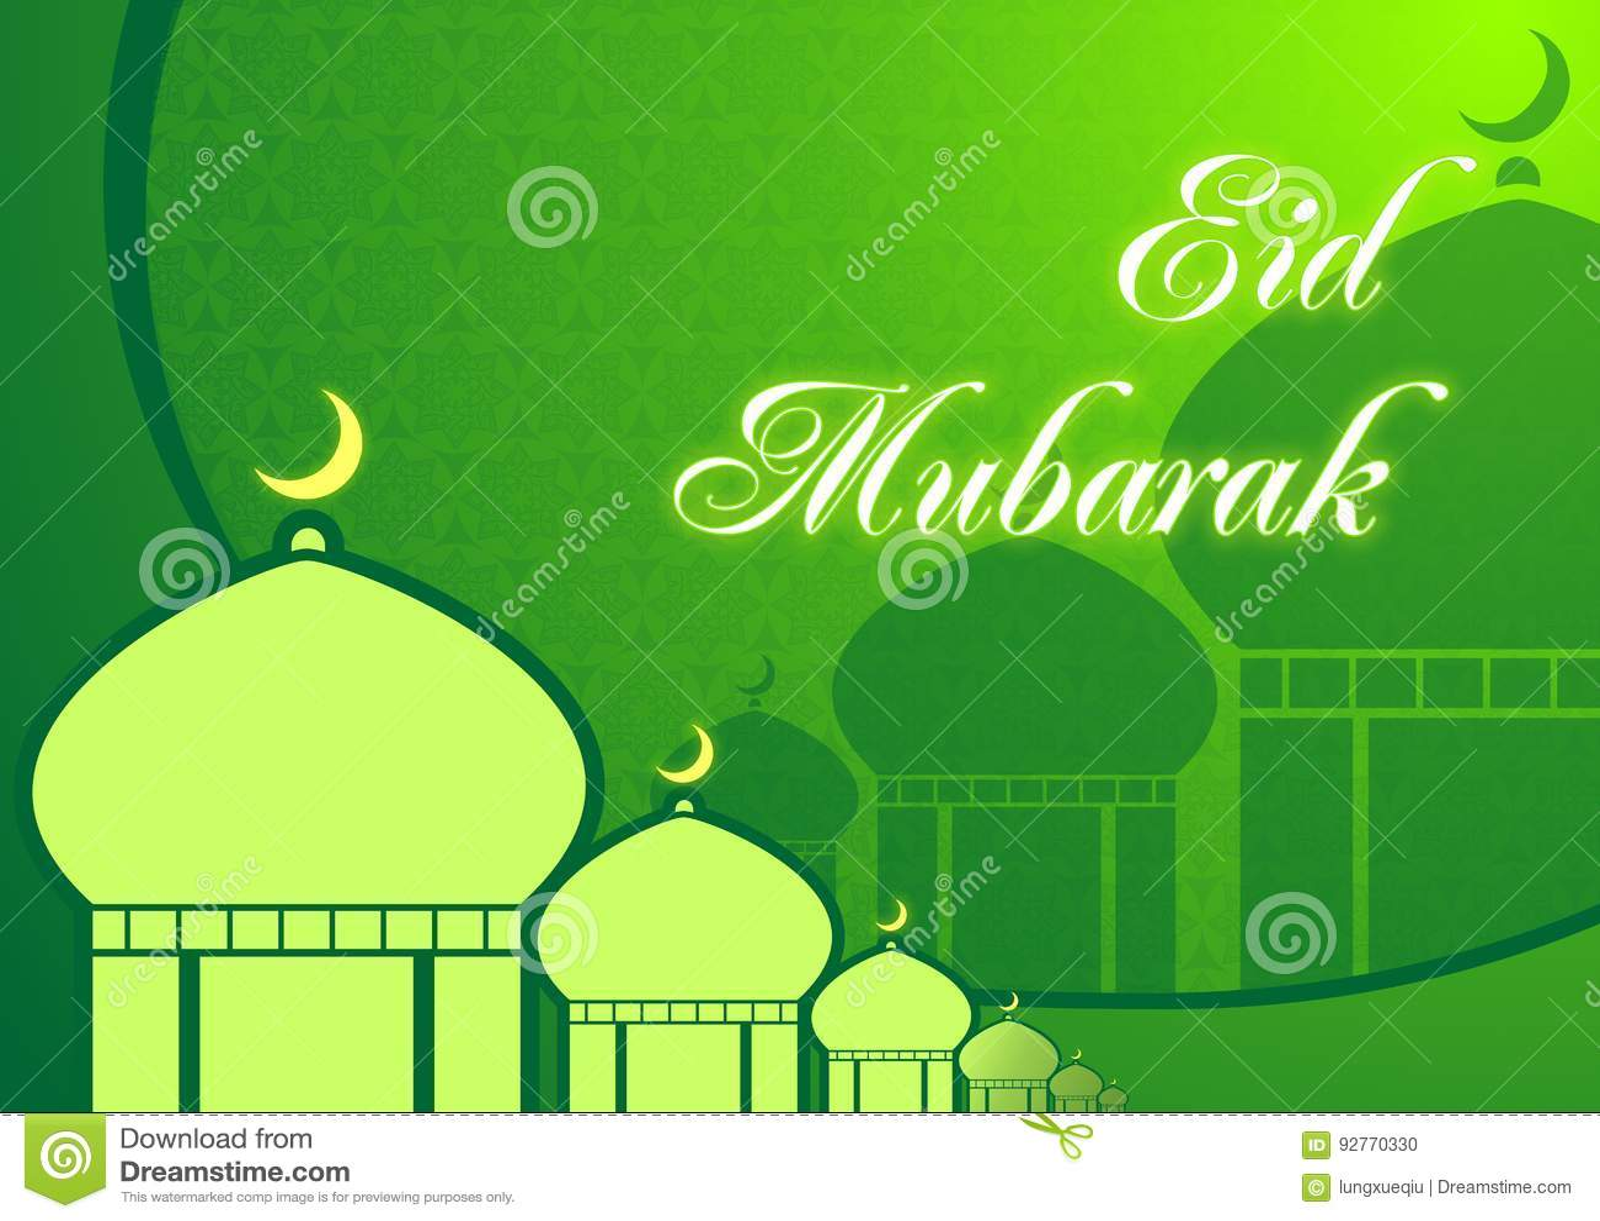 Ramadan and eid greeting card stock vector illustration of concept ramadan and eid greeting card m4hsunfo